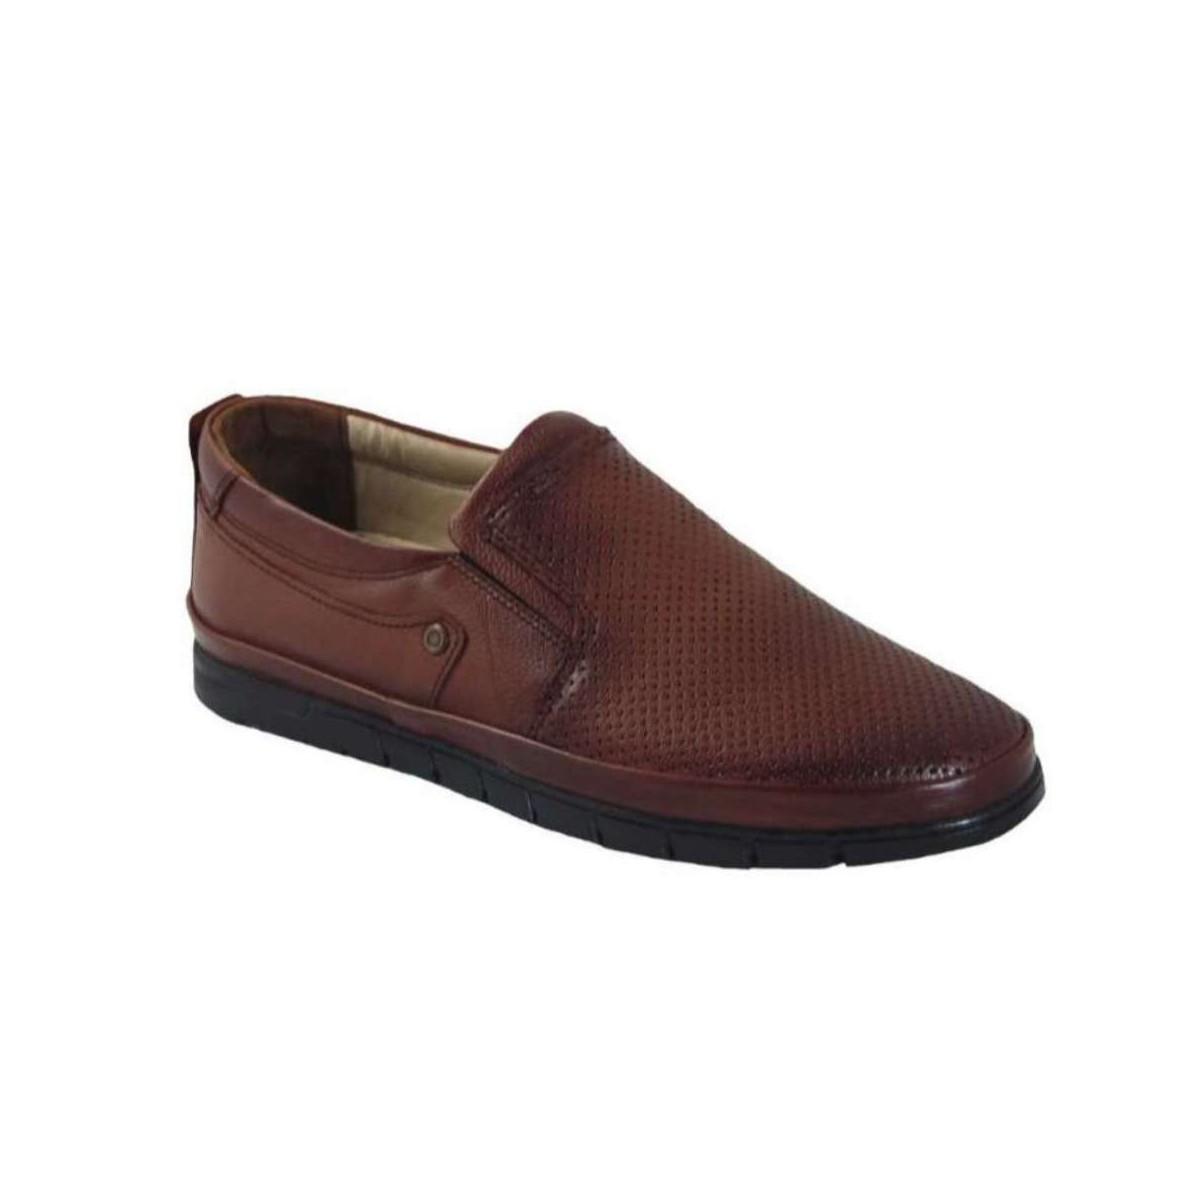 Tsimpolis Shoes 605 Ανδρικό Slip On Δερμάτινο Ταμπά